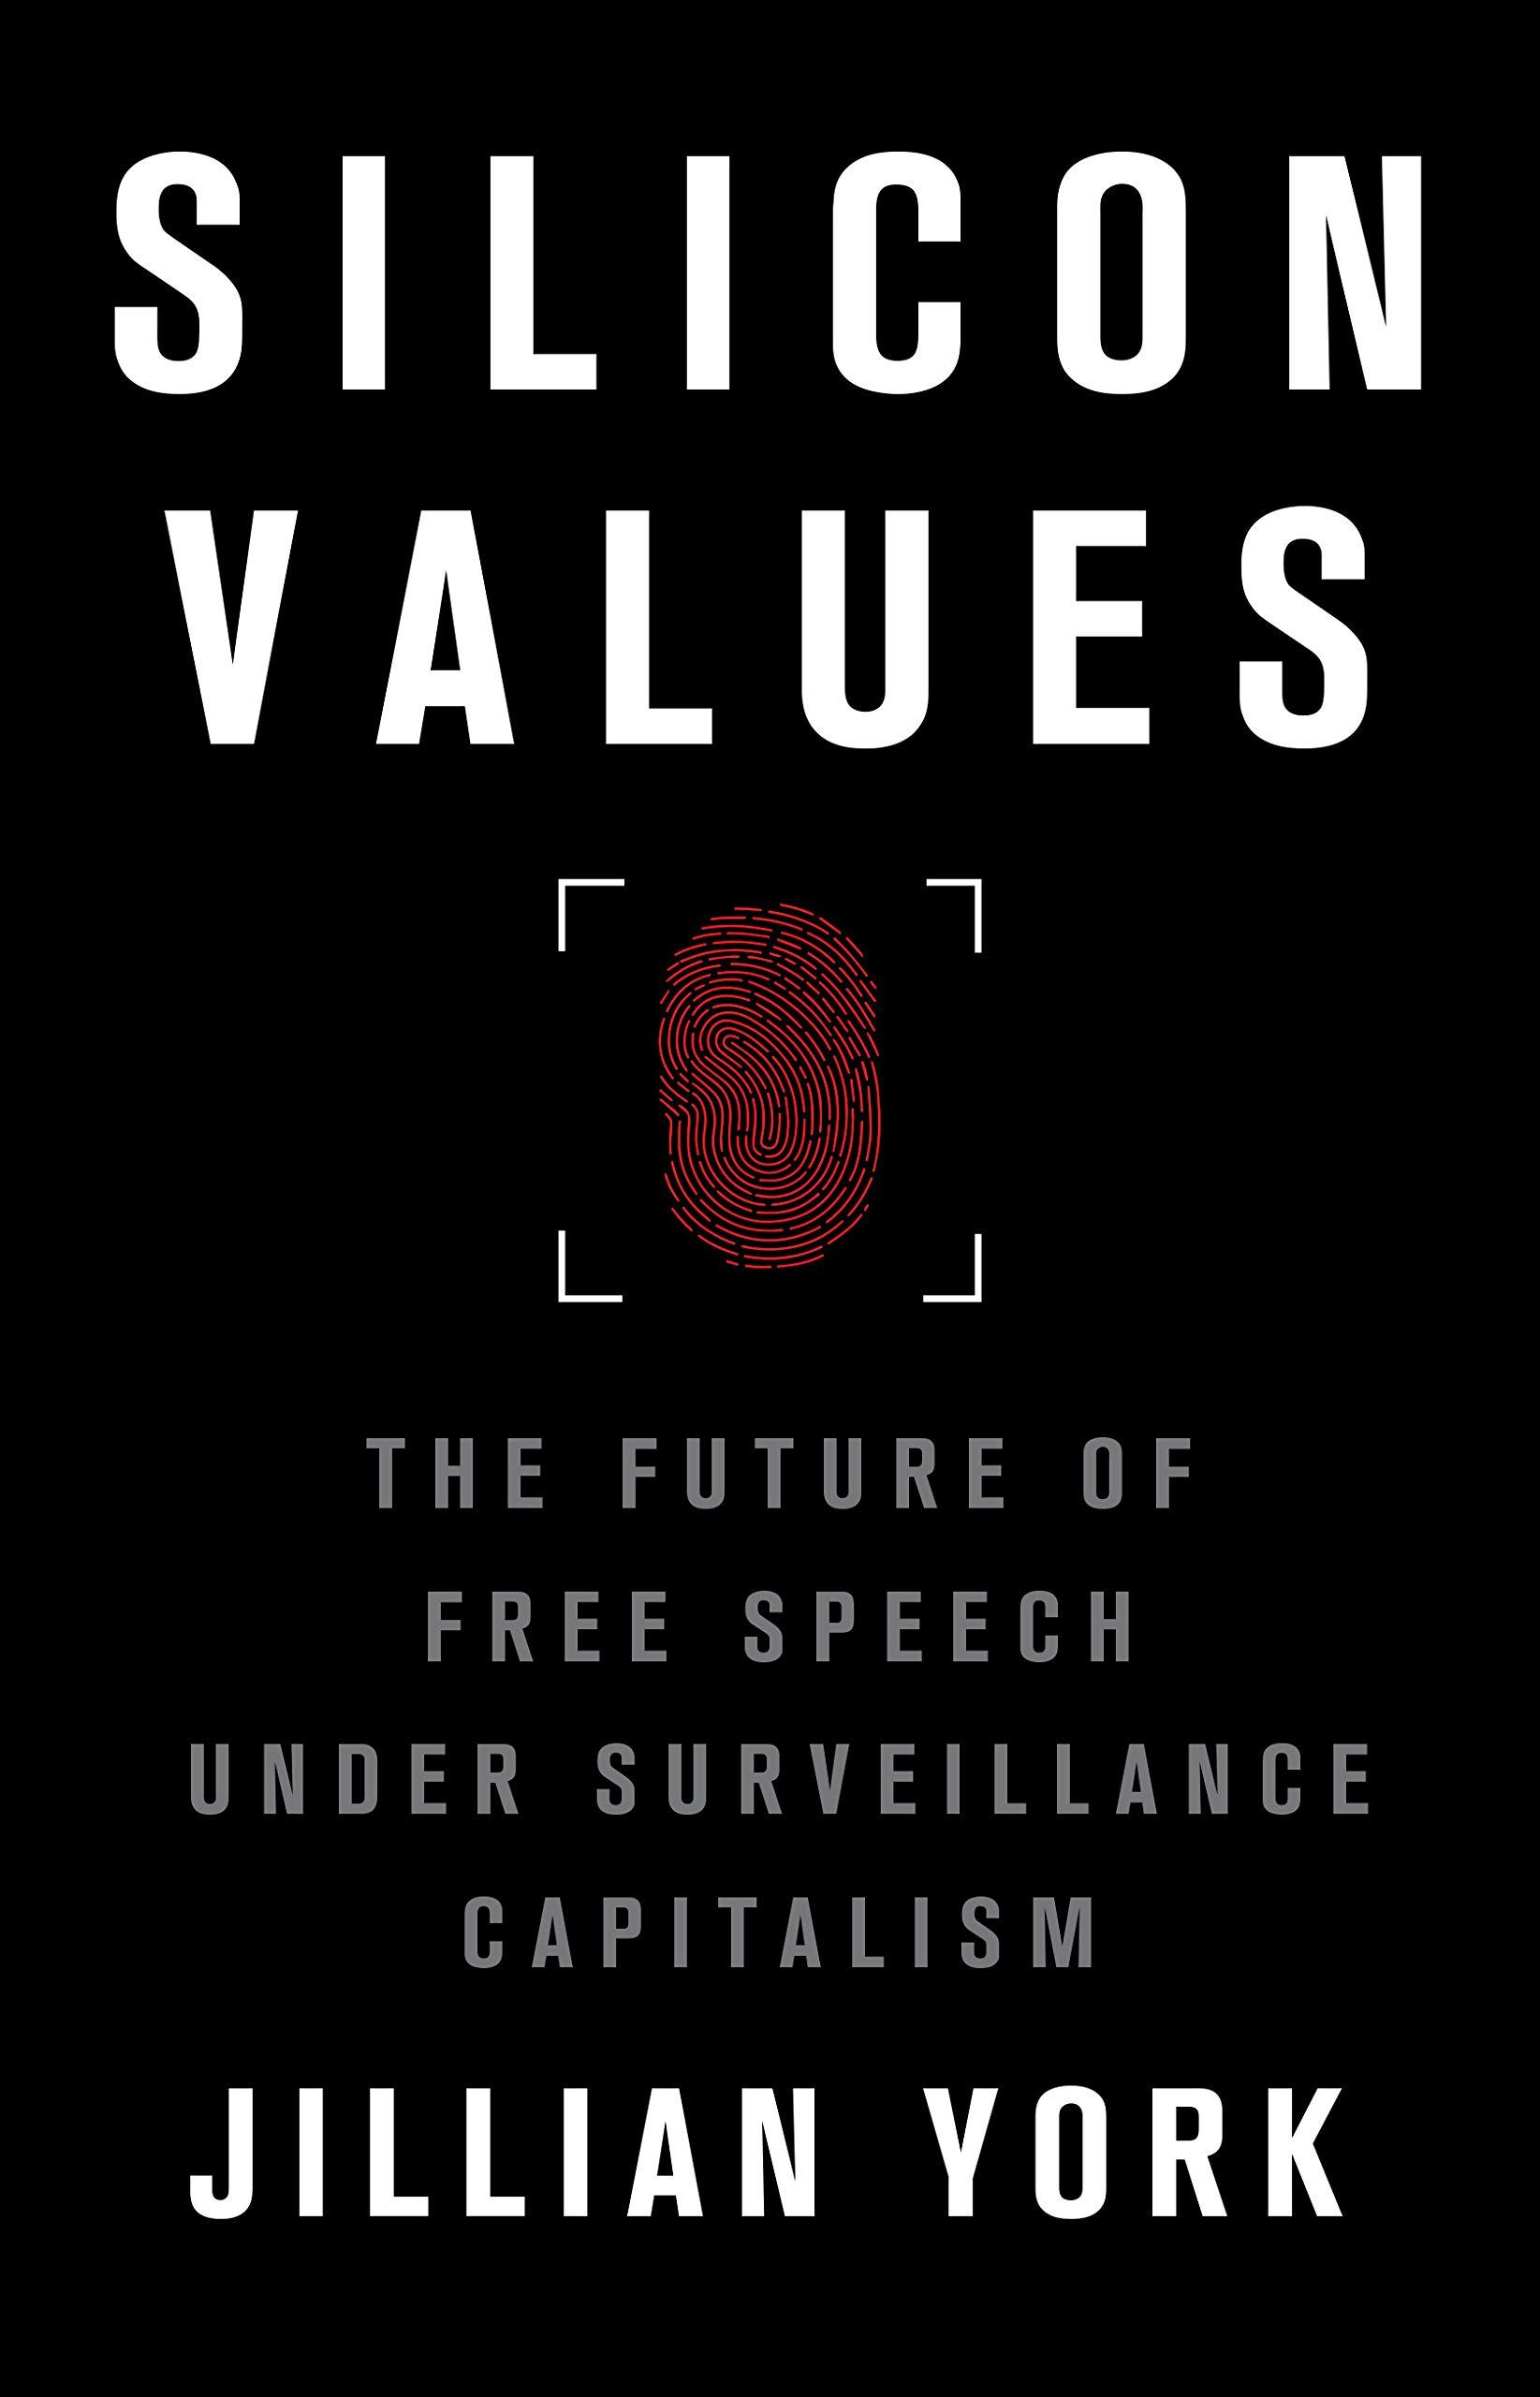 Amazon.com: Silicon Values: The Future of Free Speech Under Surveillance  Capitalism (9781788738804): York, Jillian C.: Books